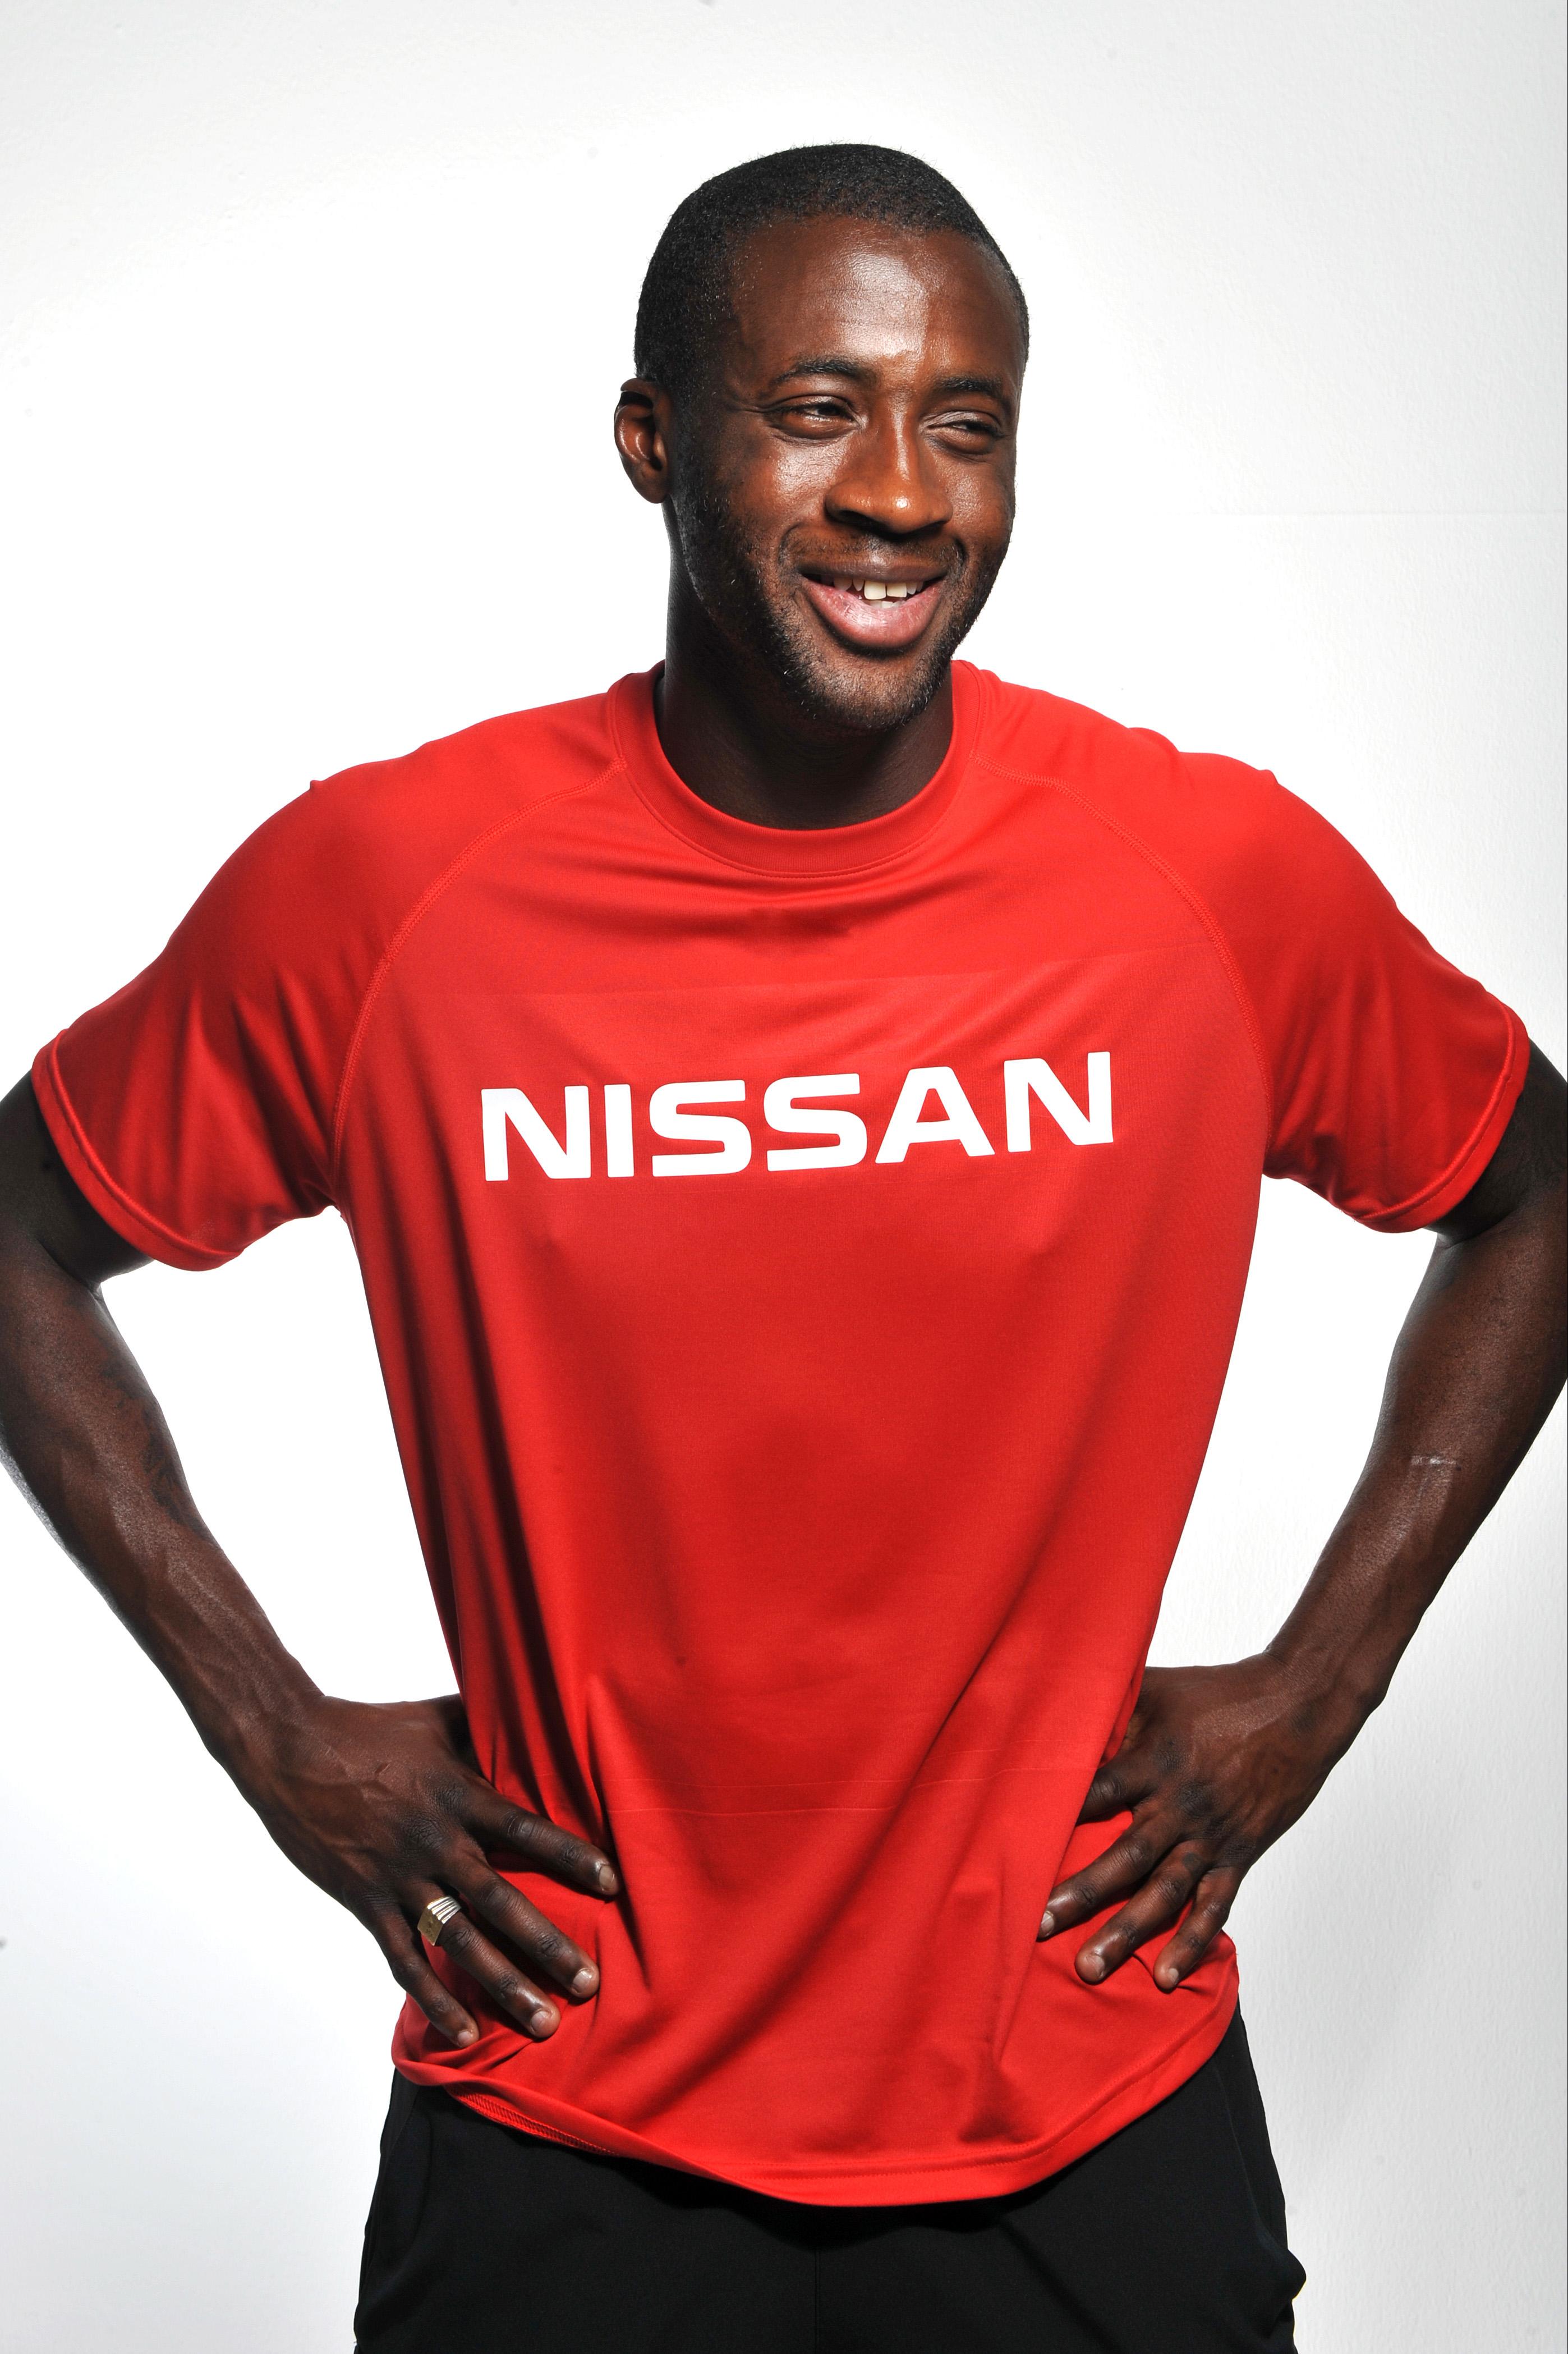 Manchester City S Yaya Toure Becomes Nissan Ambassador